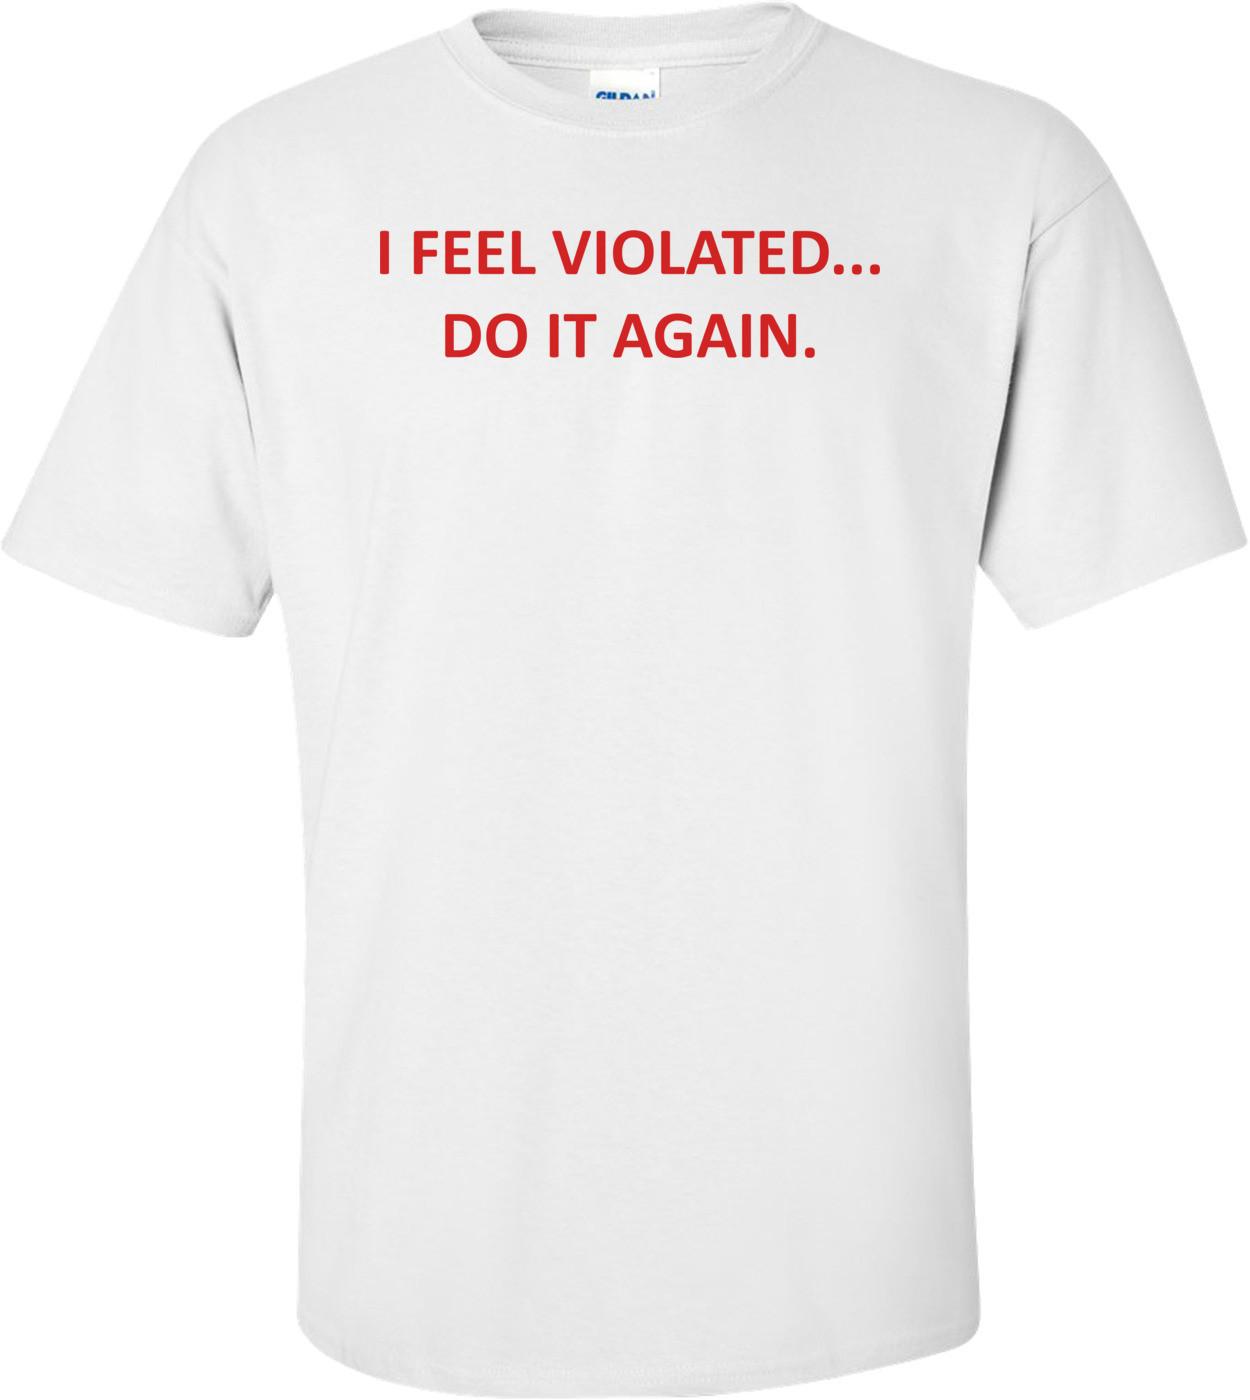 I FEEL VIOLATED... DO IT AGAIN. Shirt